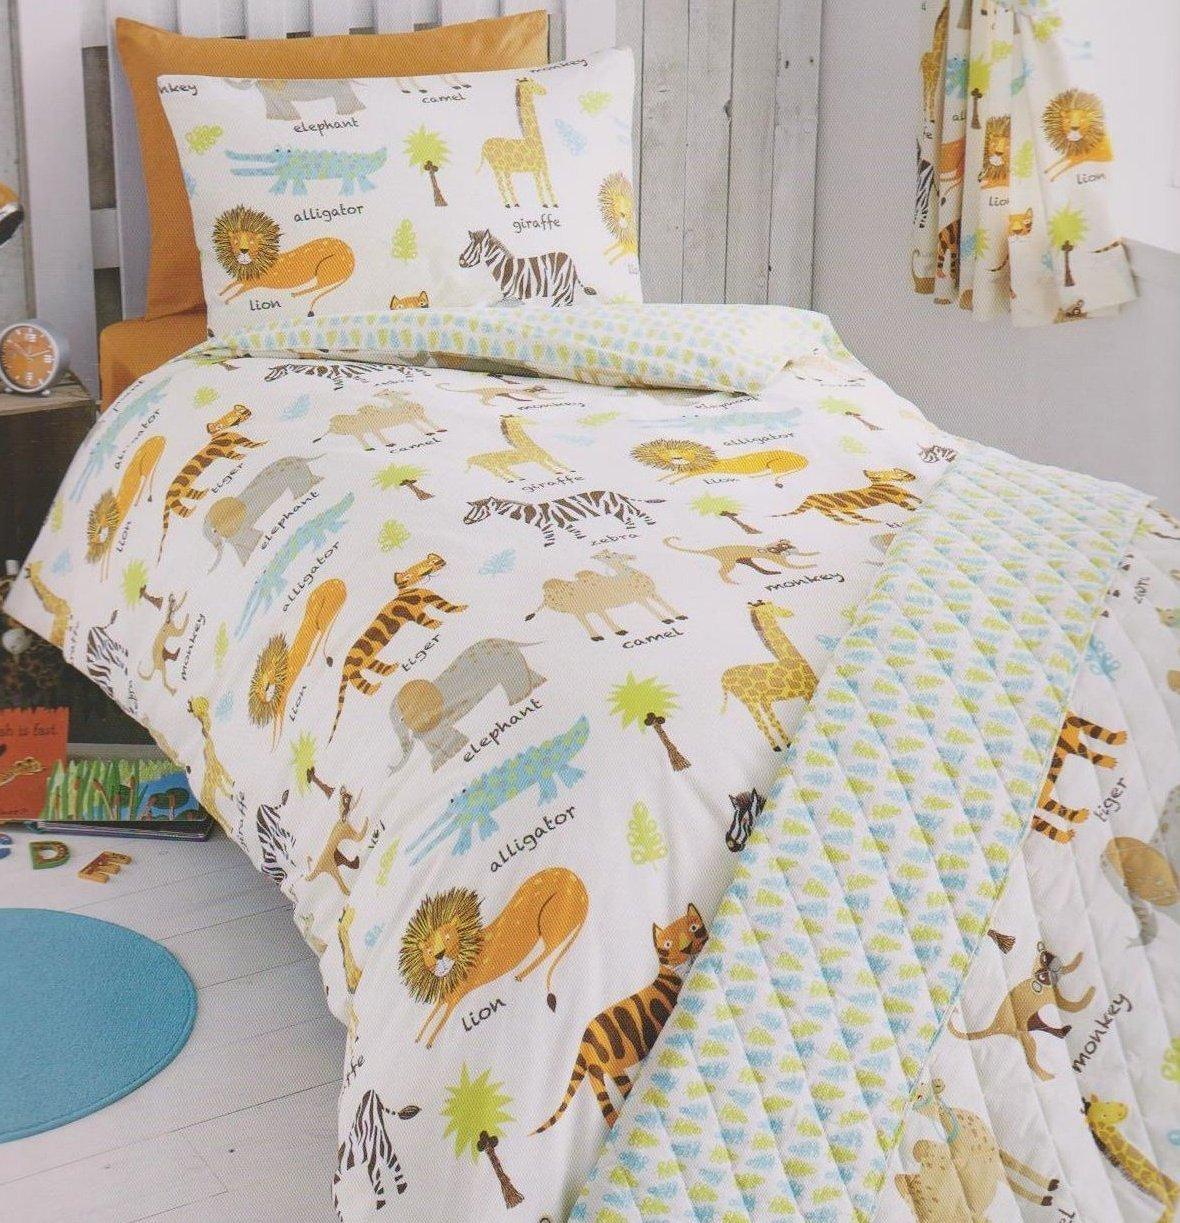 Single Bed Cheeky Monkey Childrens Duvet Cover Set